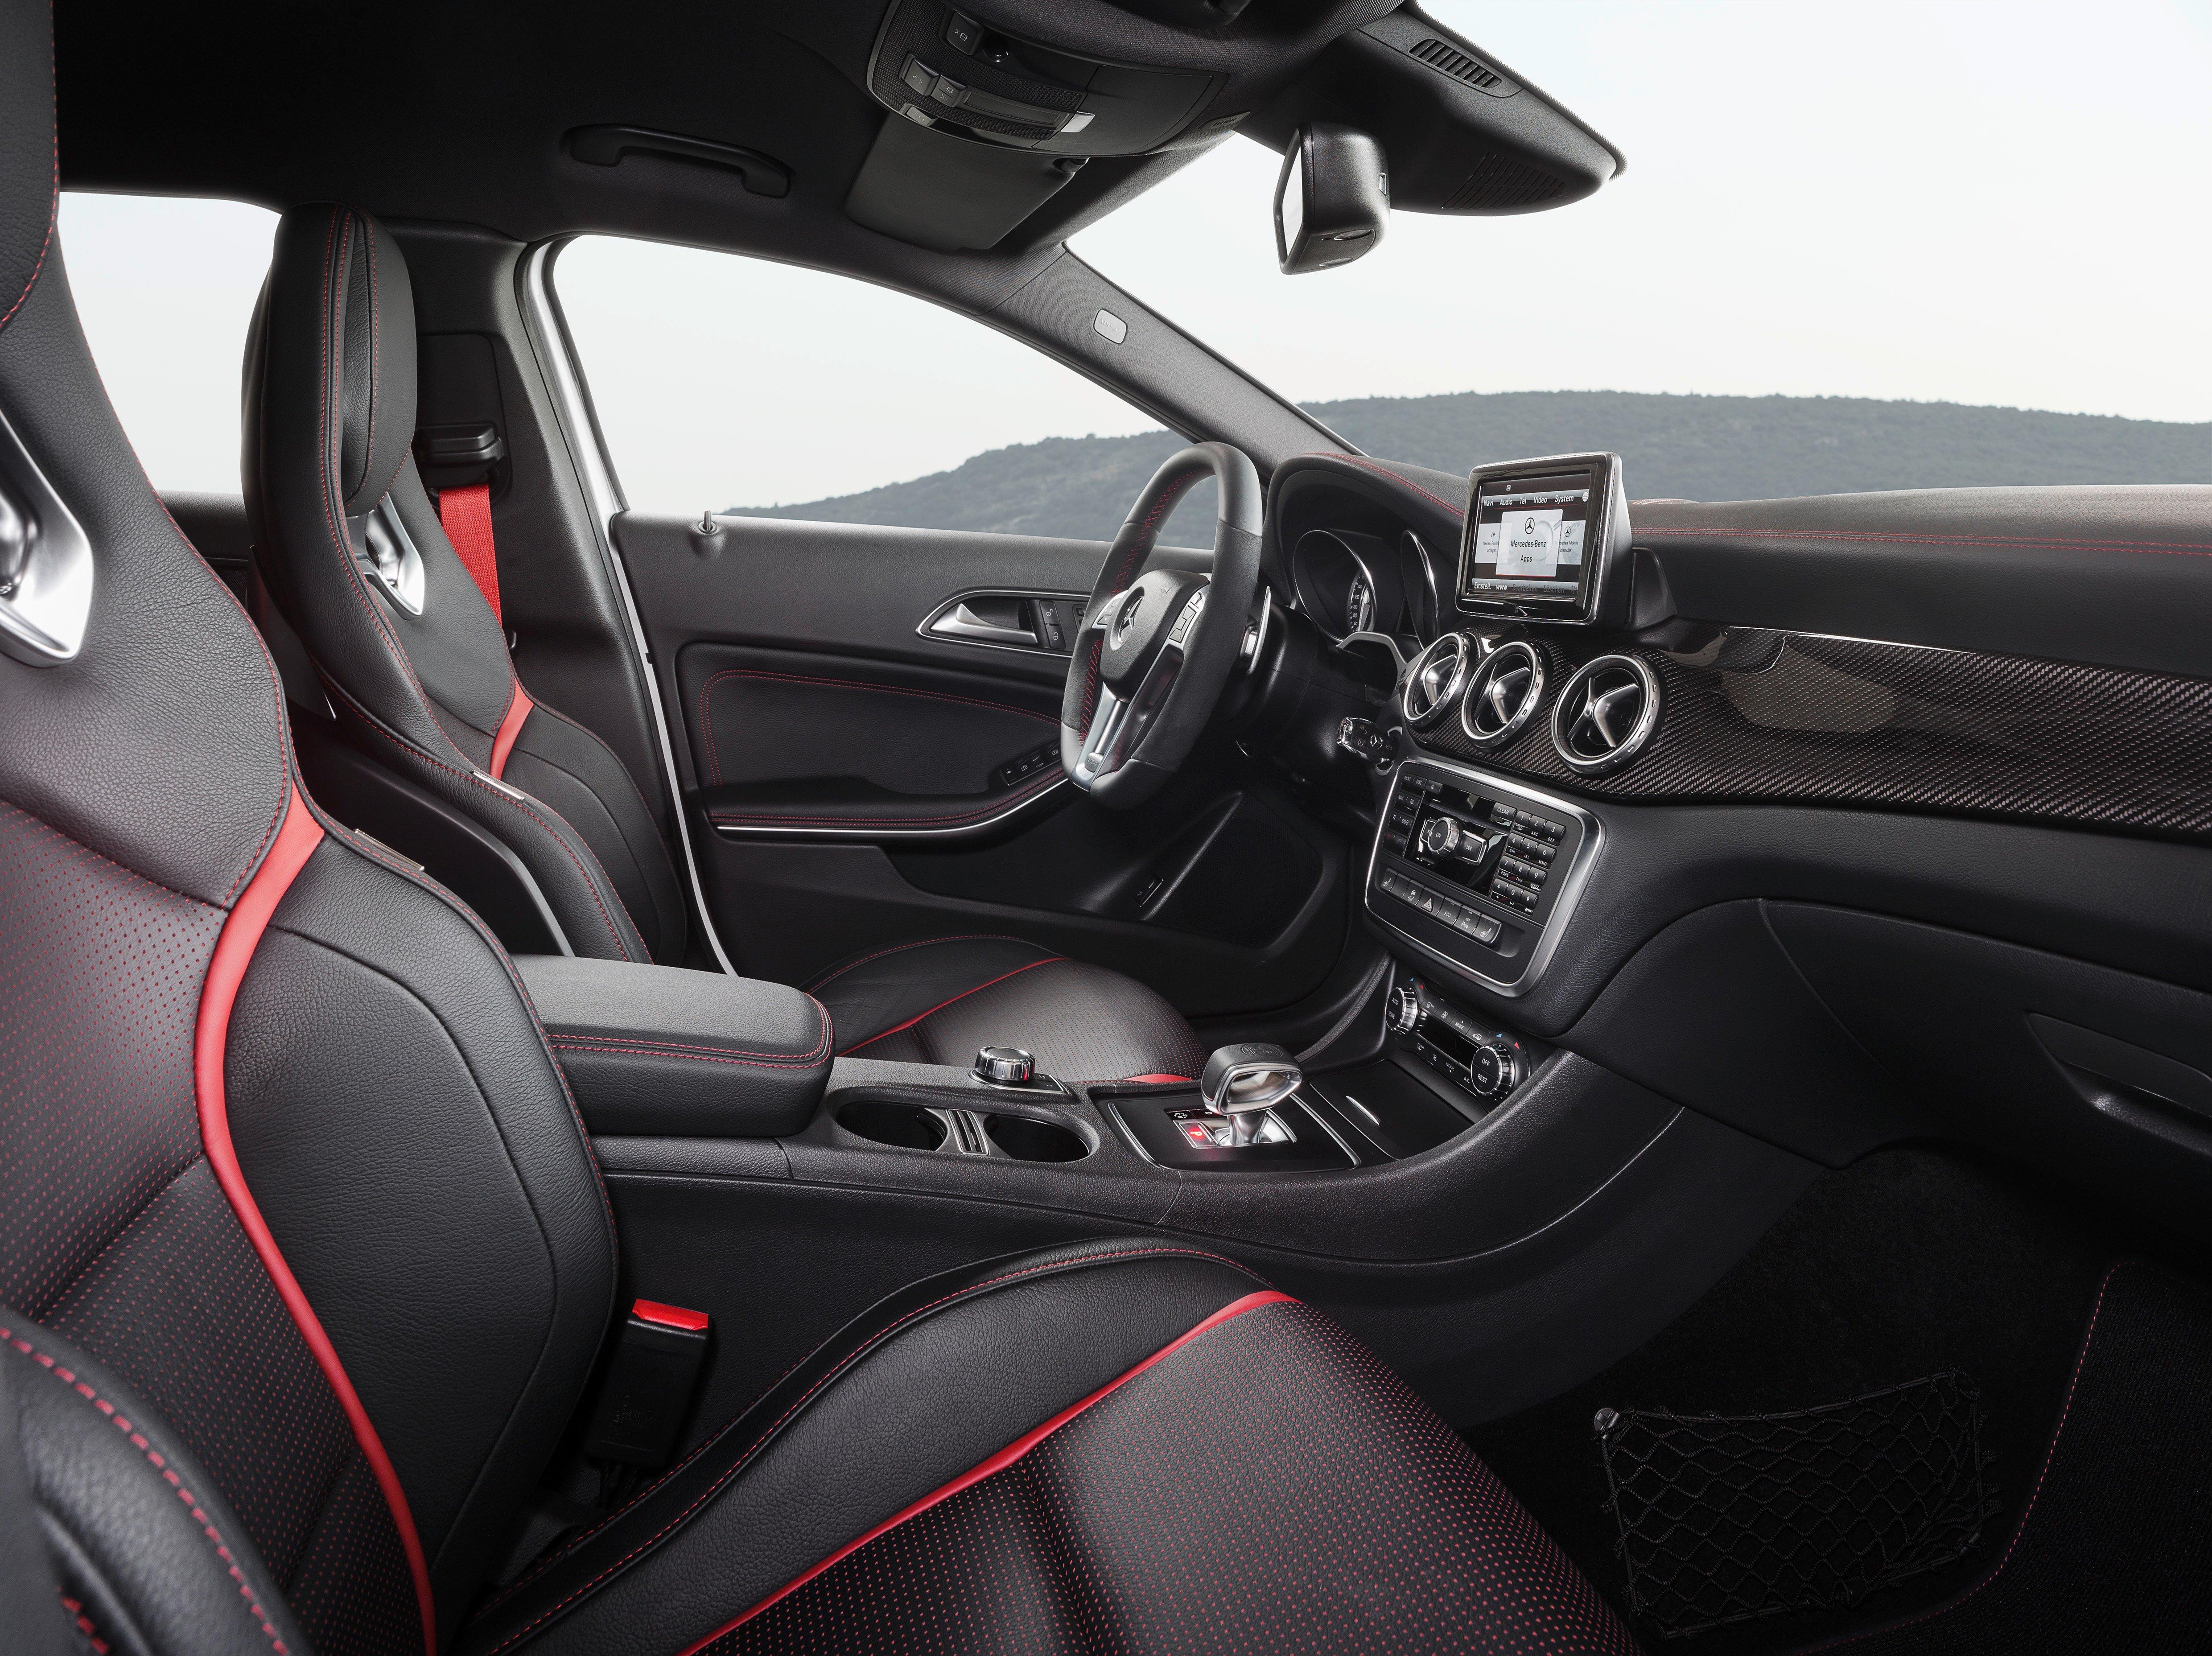 Mercedes-Benz GLA 45 AMG production car unveiled Image #221093